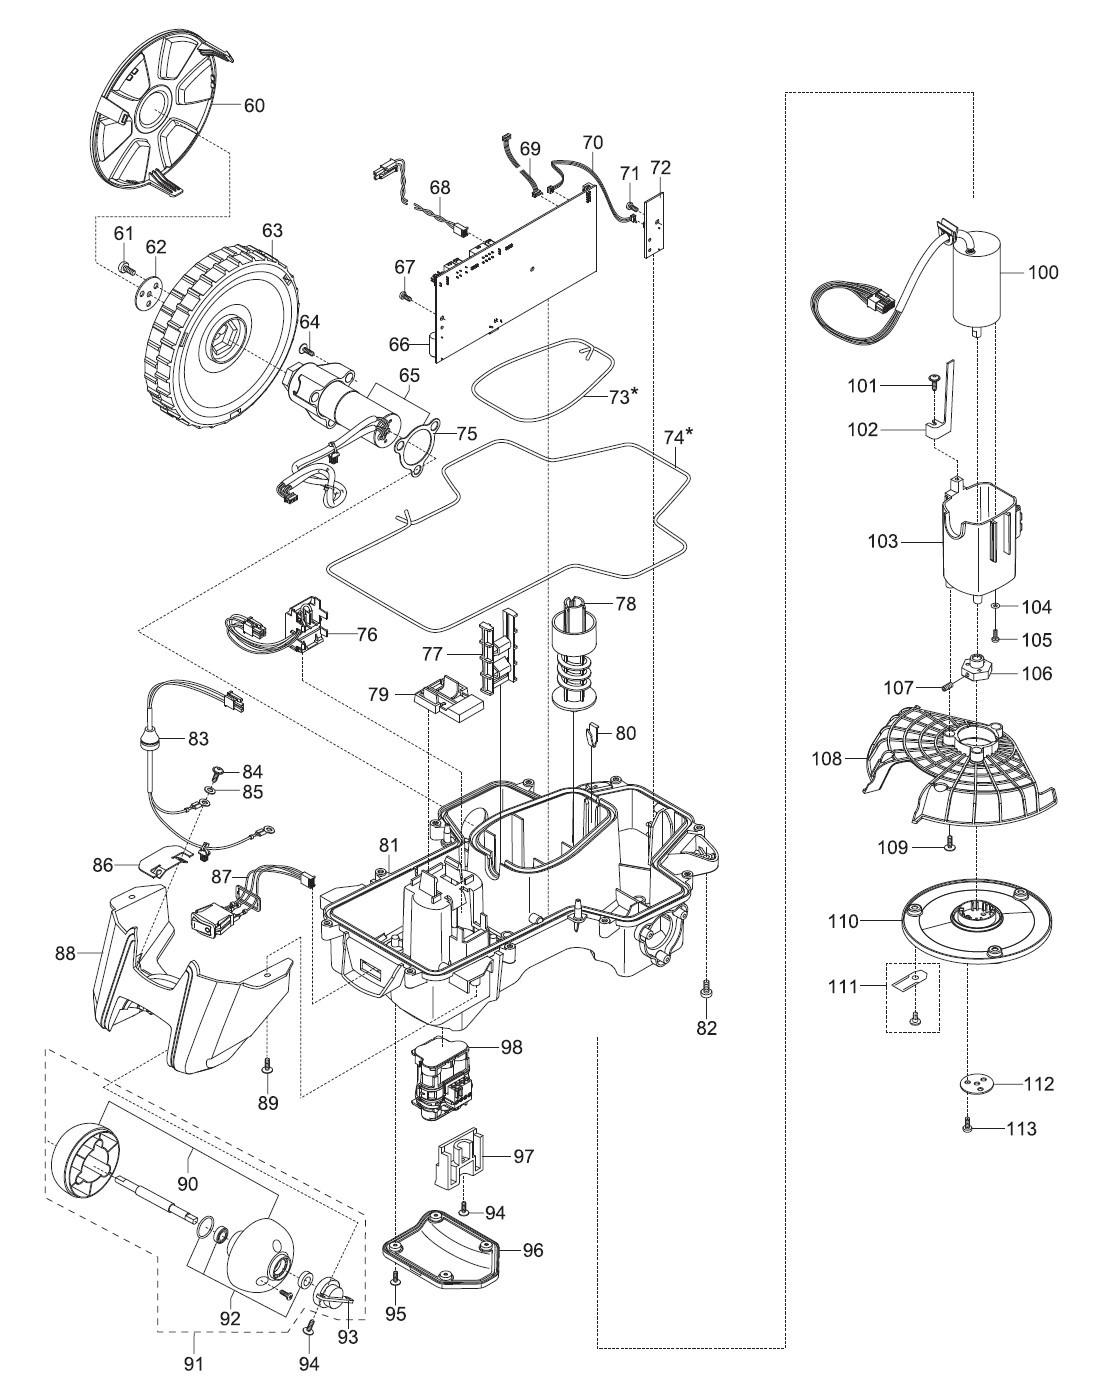 gardena ersatzteile unterteile m hroboter r50li 4077 20. Black Bedroom Furniture Sets. Home Design Ideas